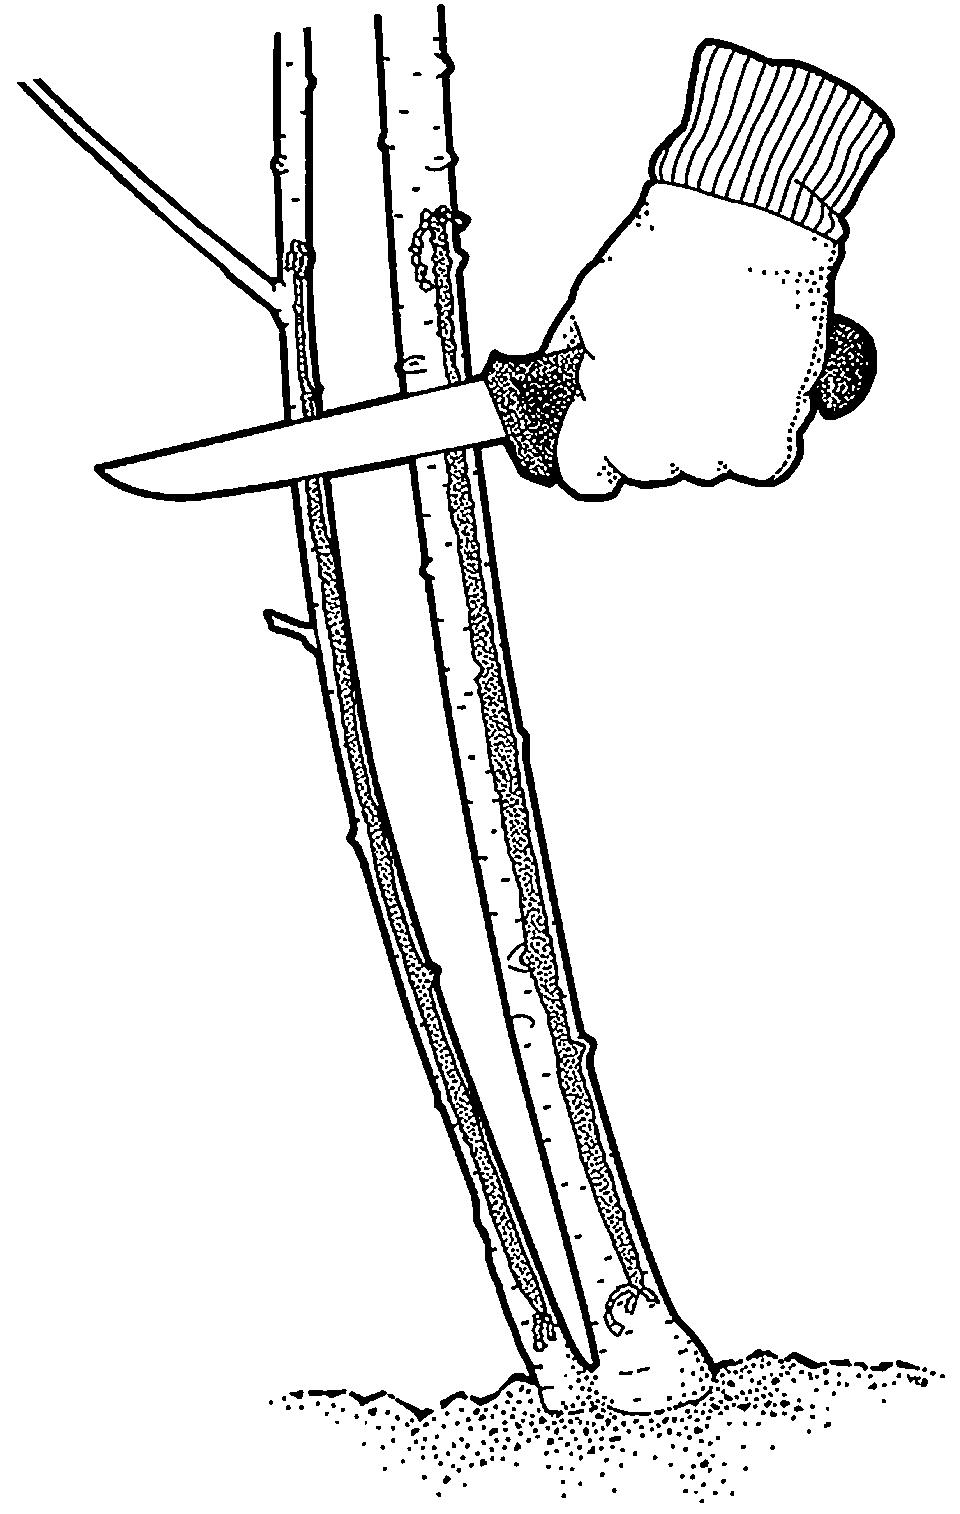 Using knife to scrape long gashes along stem